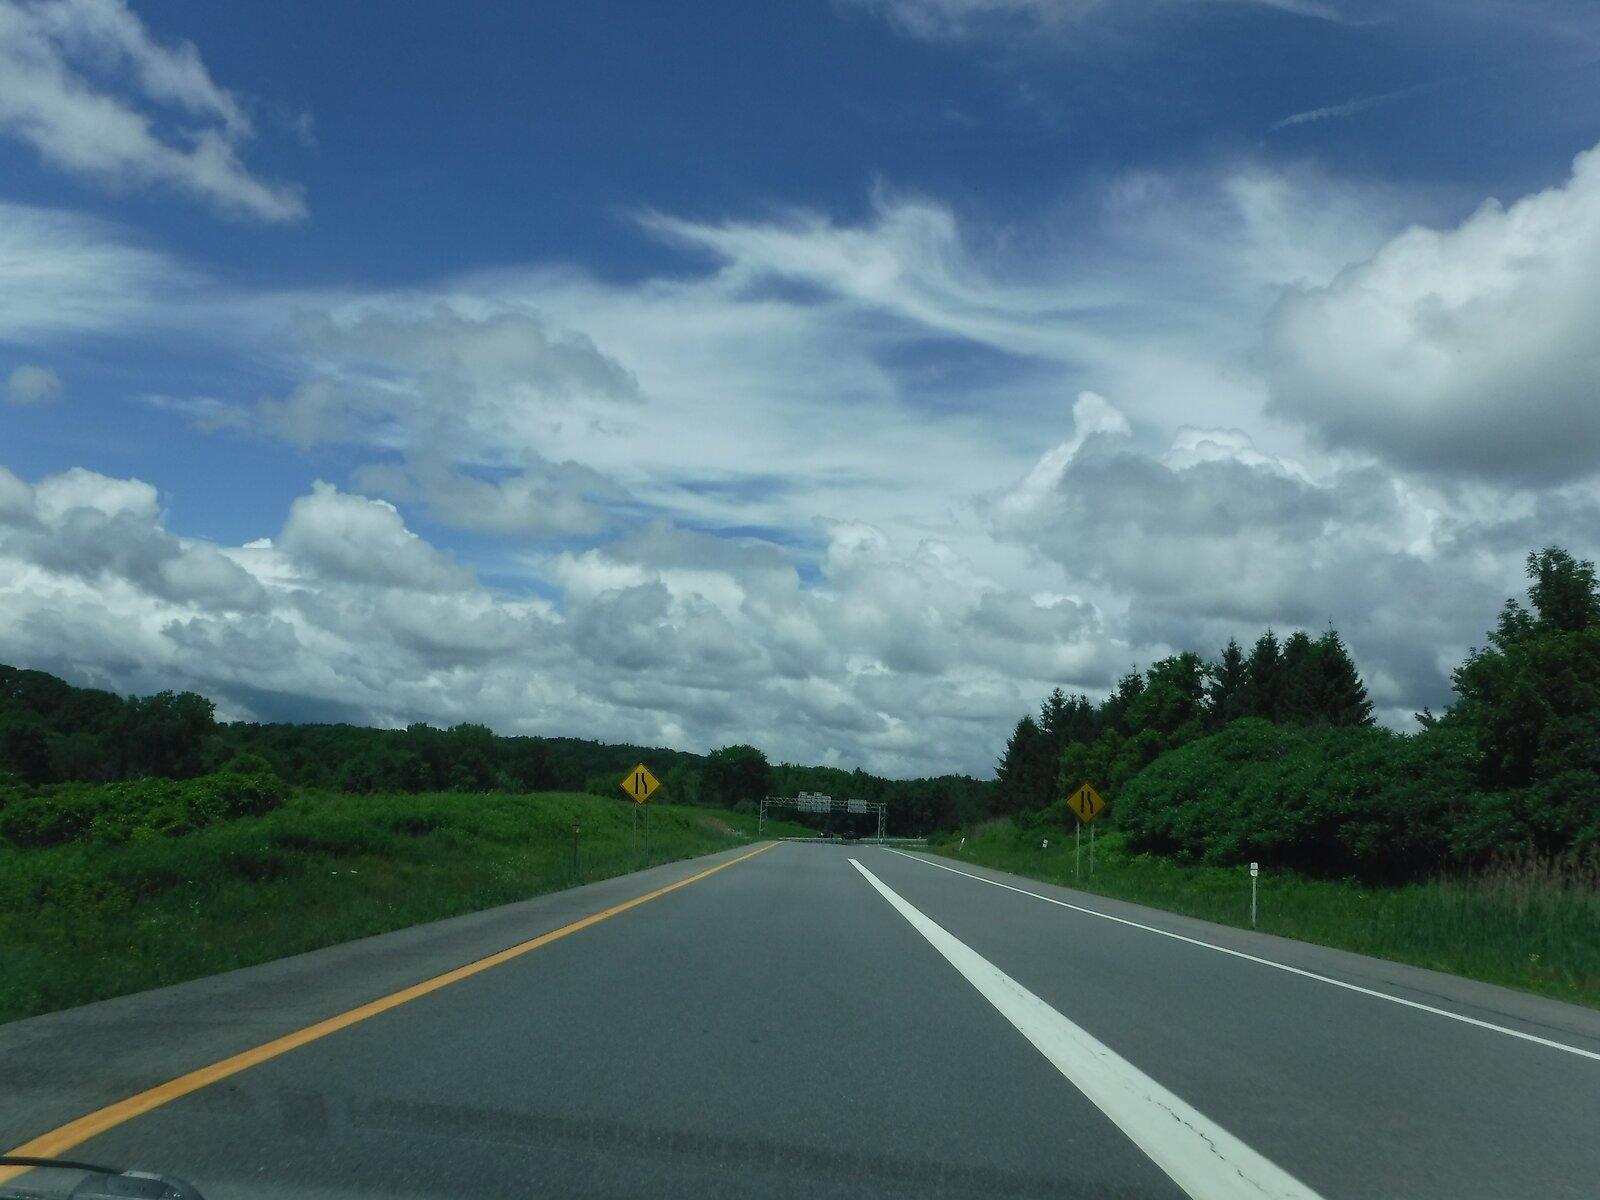 XP90 clouds 004.JPG